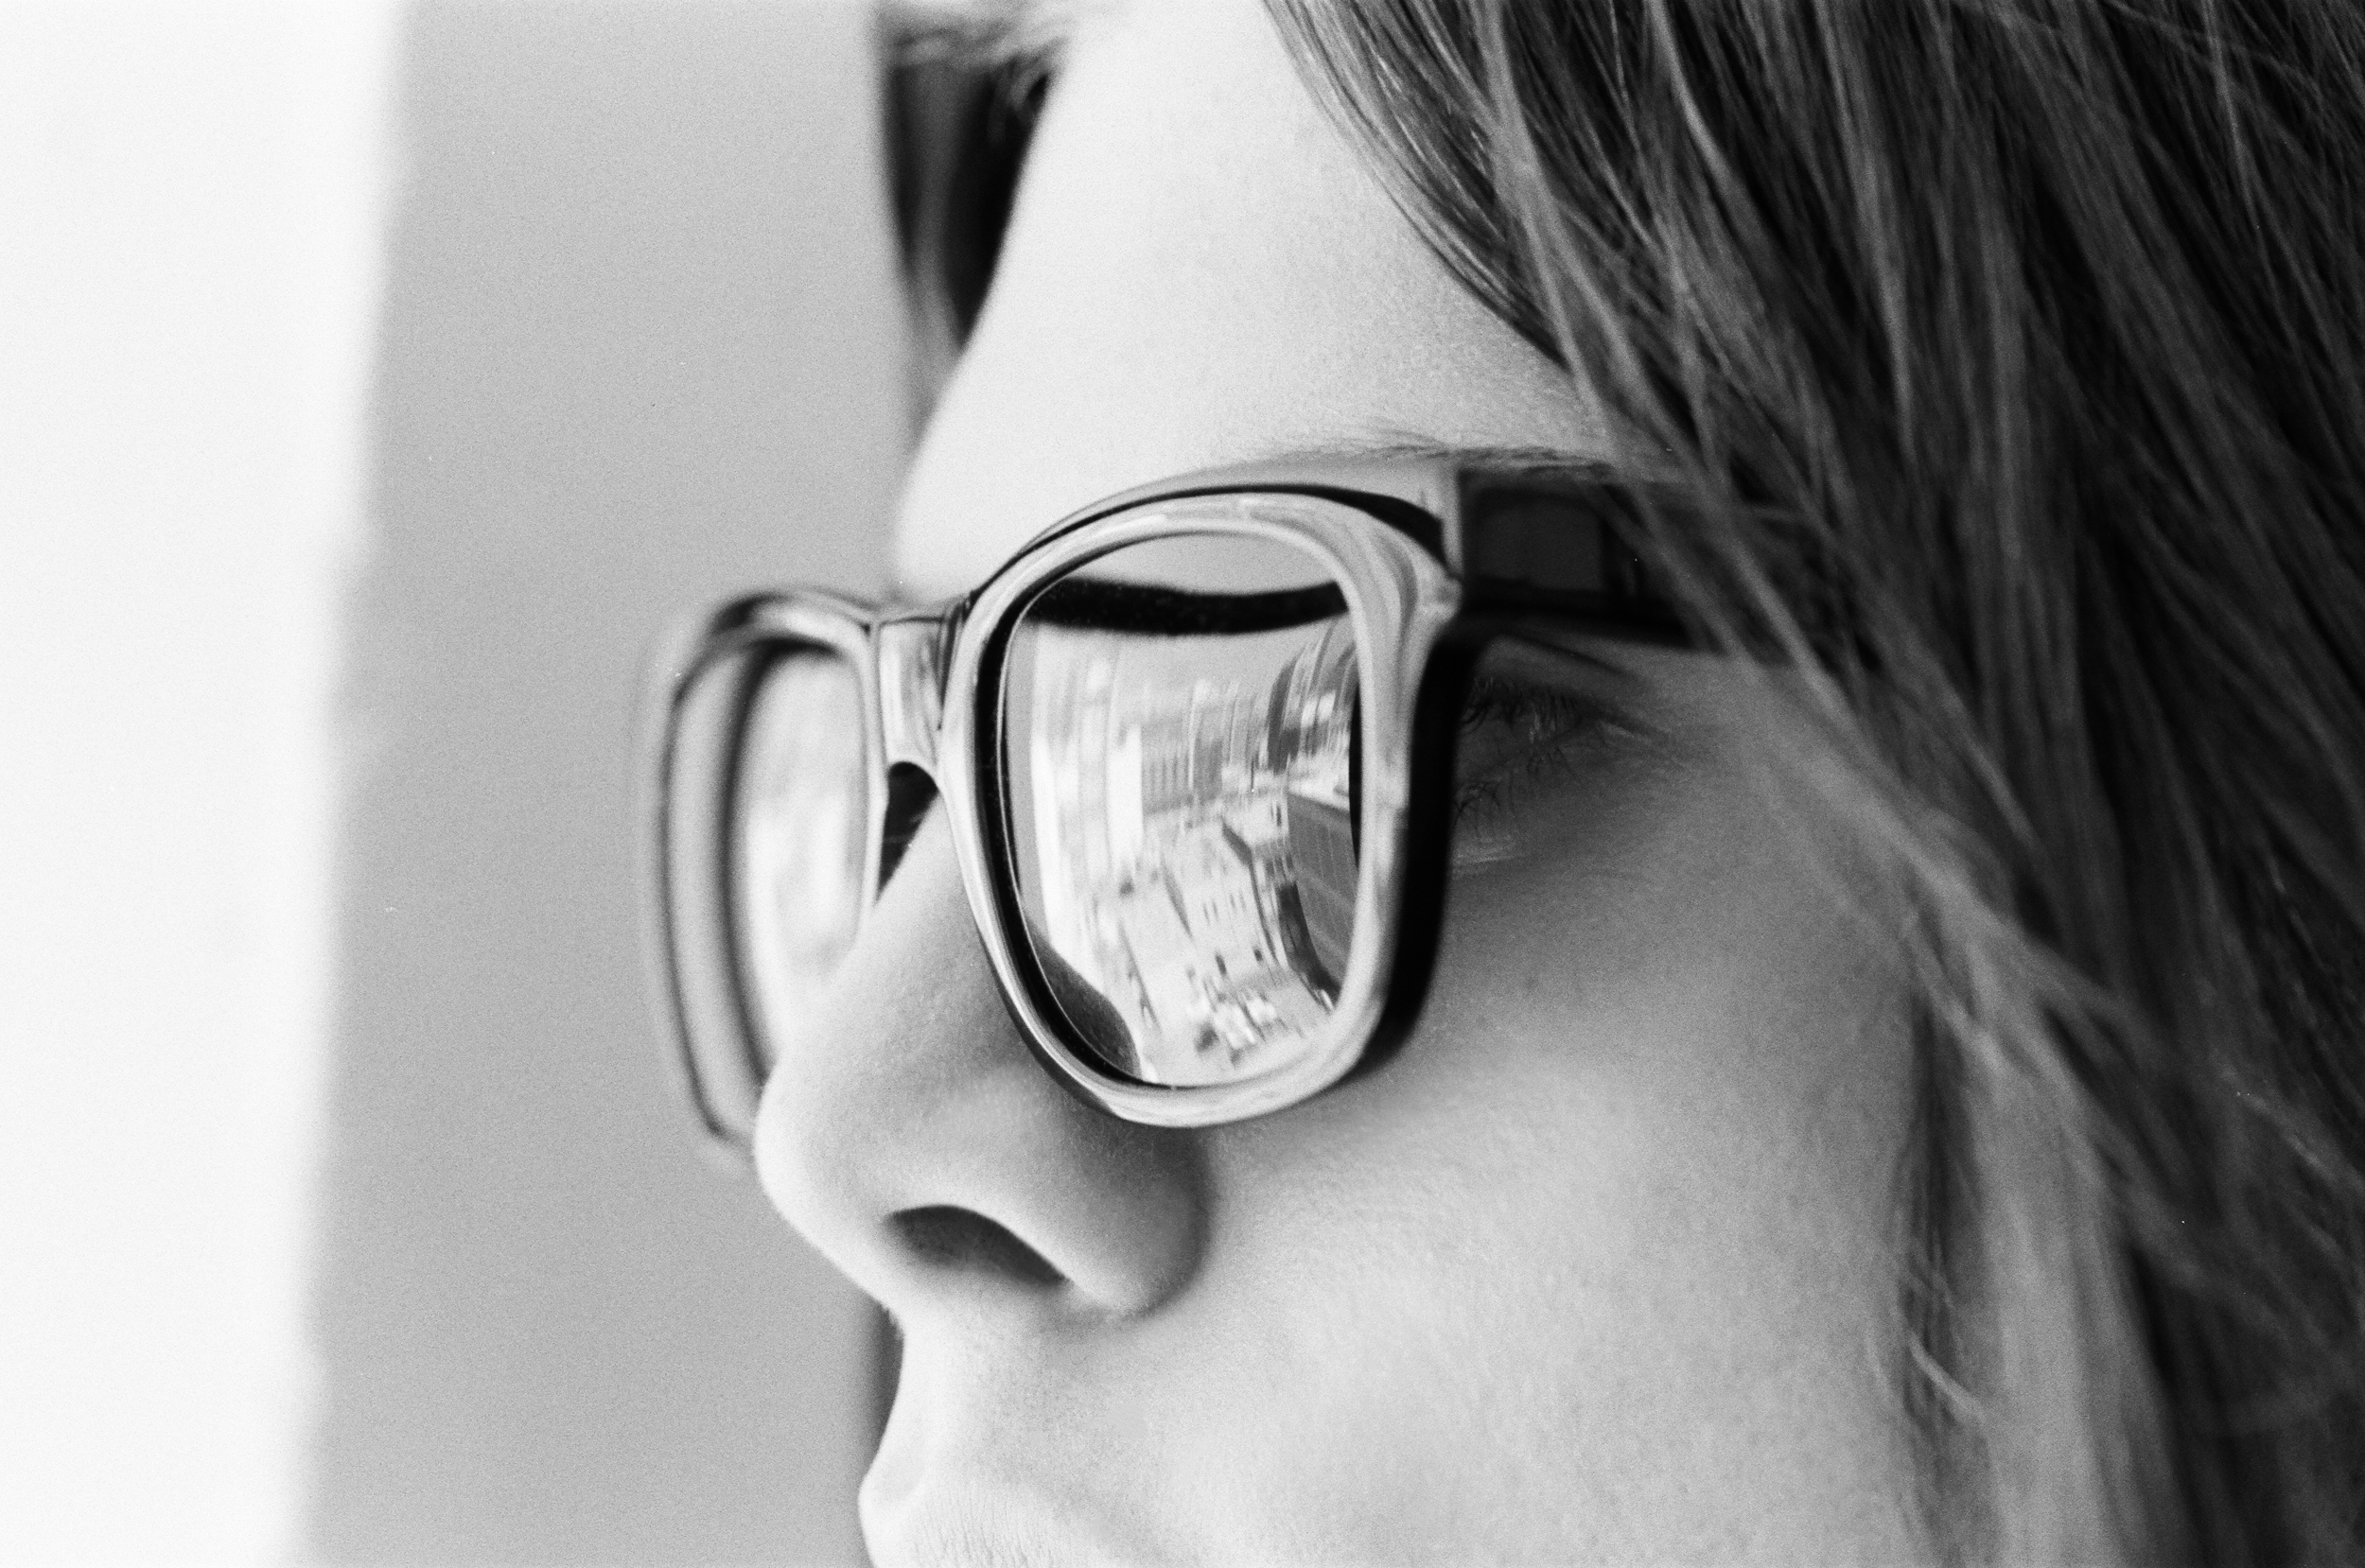 2017-filtrate-eyewear-portrait-acetate-oxford-000094060003.jpg